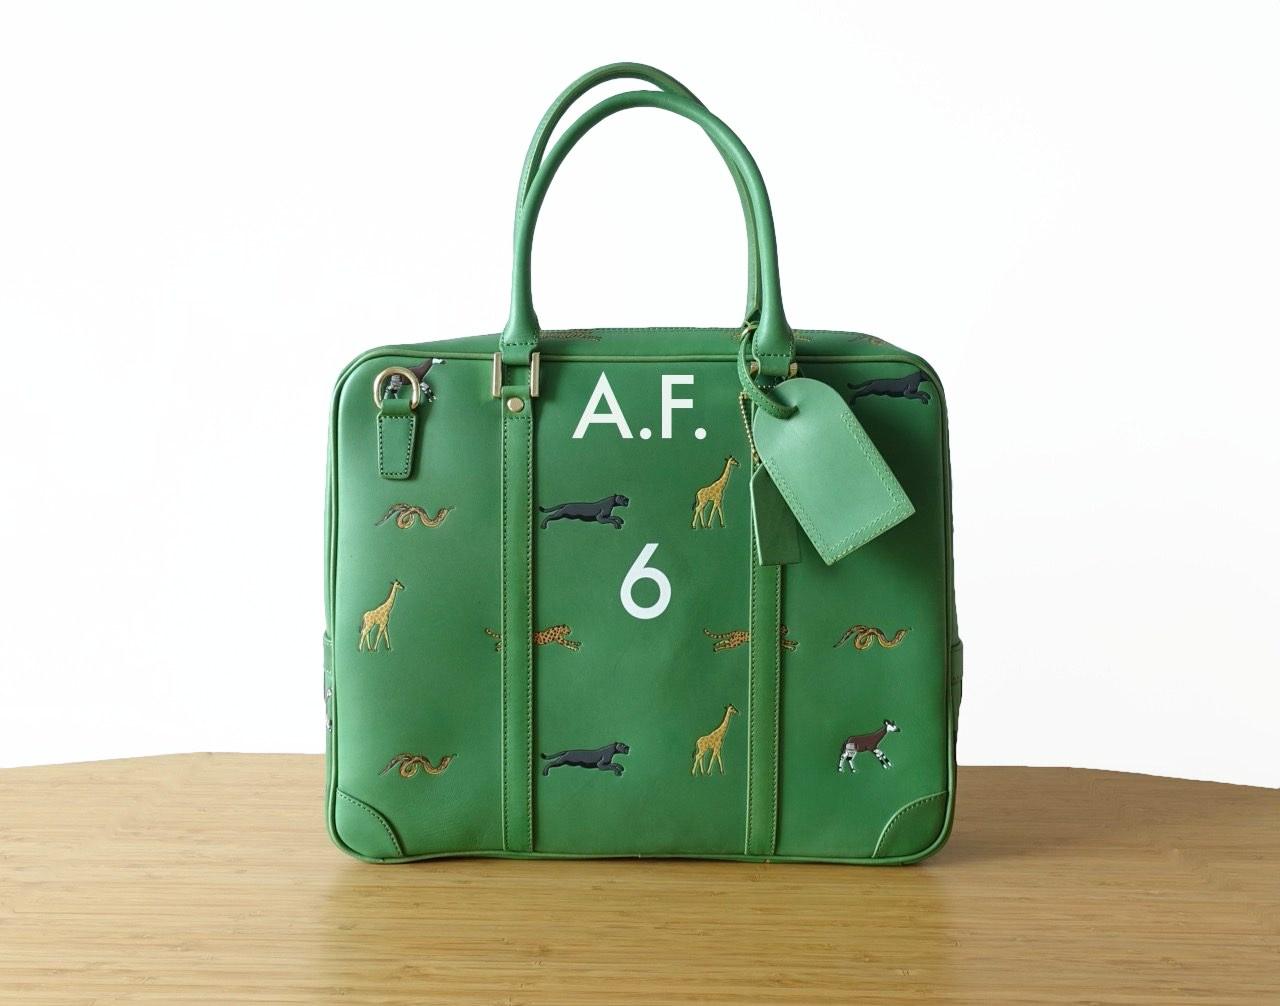 RAINFOREST BAG 6 FRONT